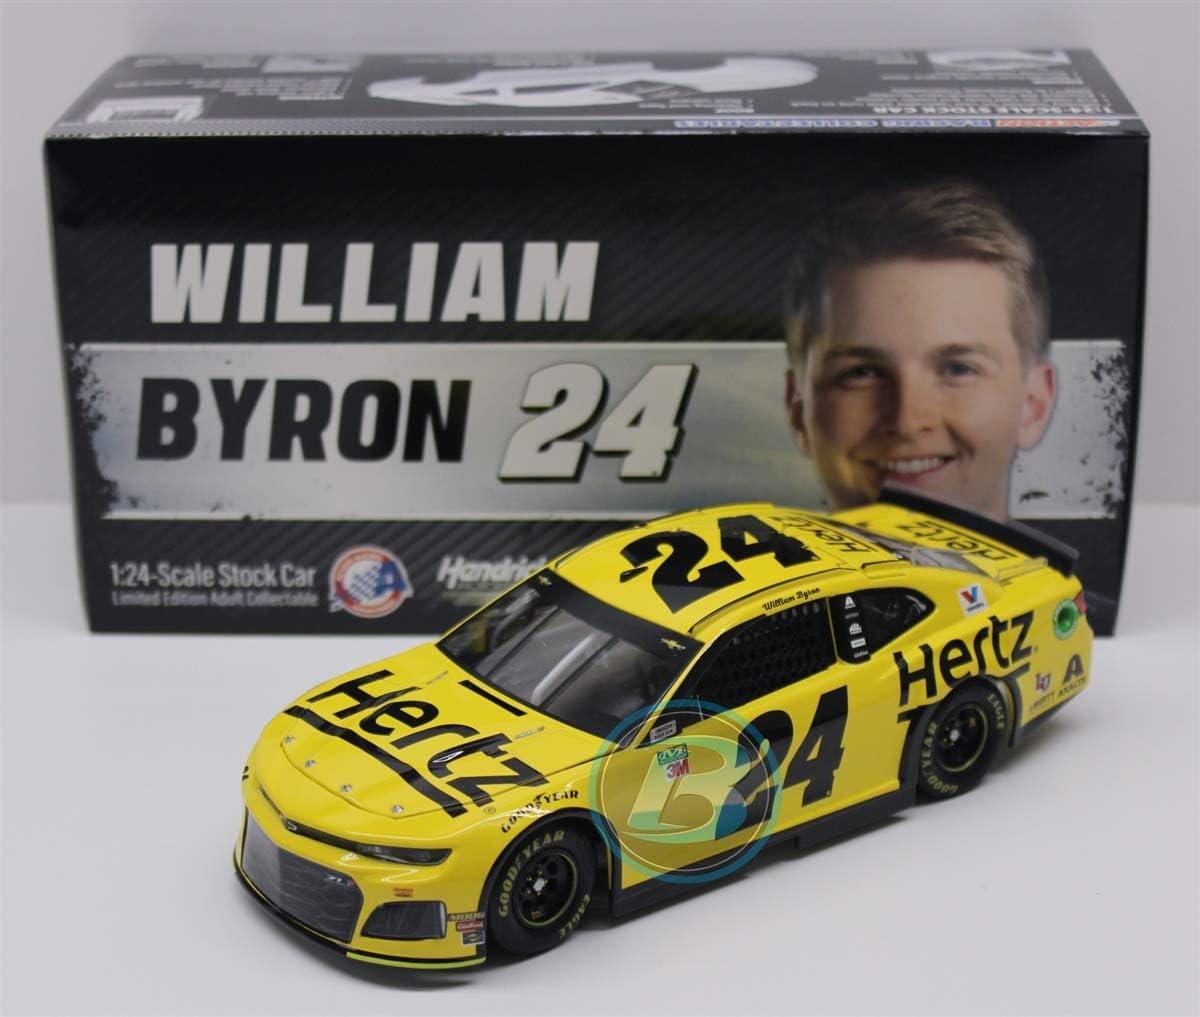 Lionel Racing Jeff Gordon William Byron #24EVER NASCAR Diecast 1:24 Scale